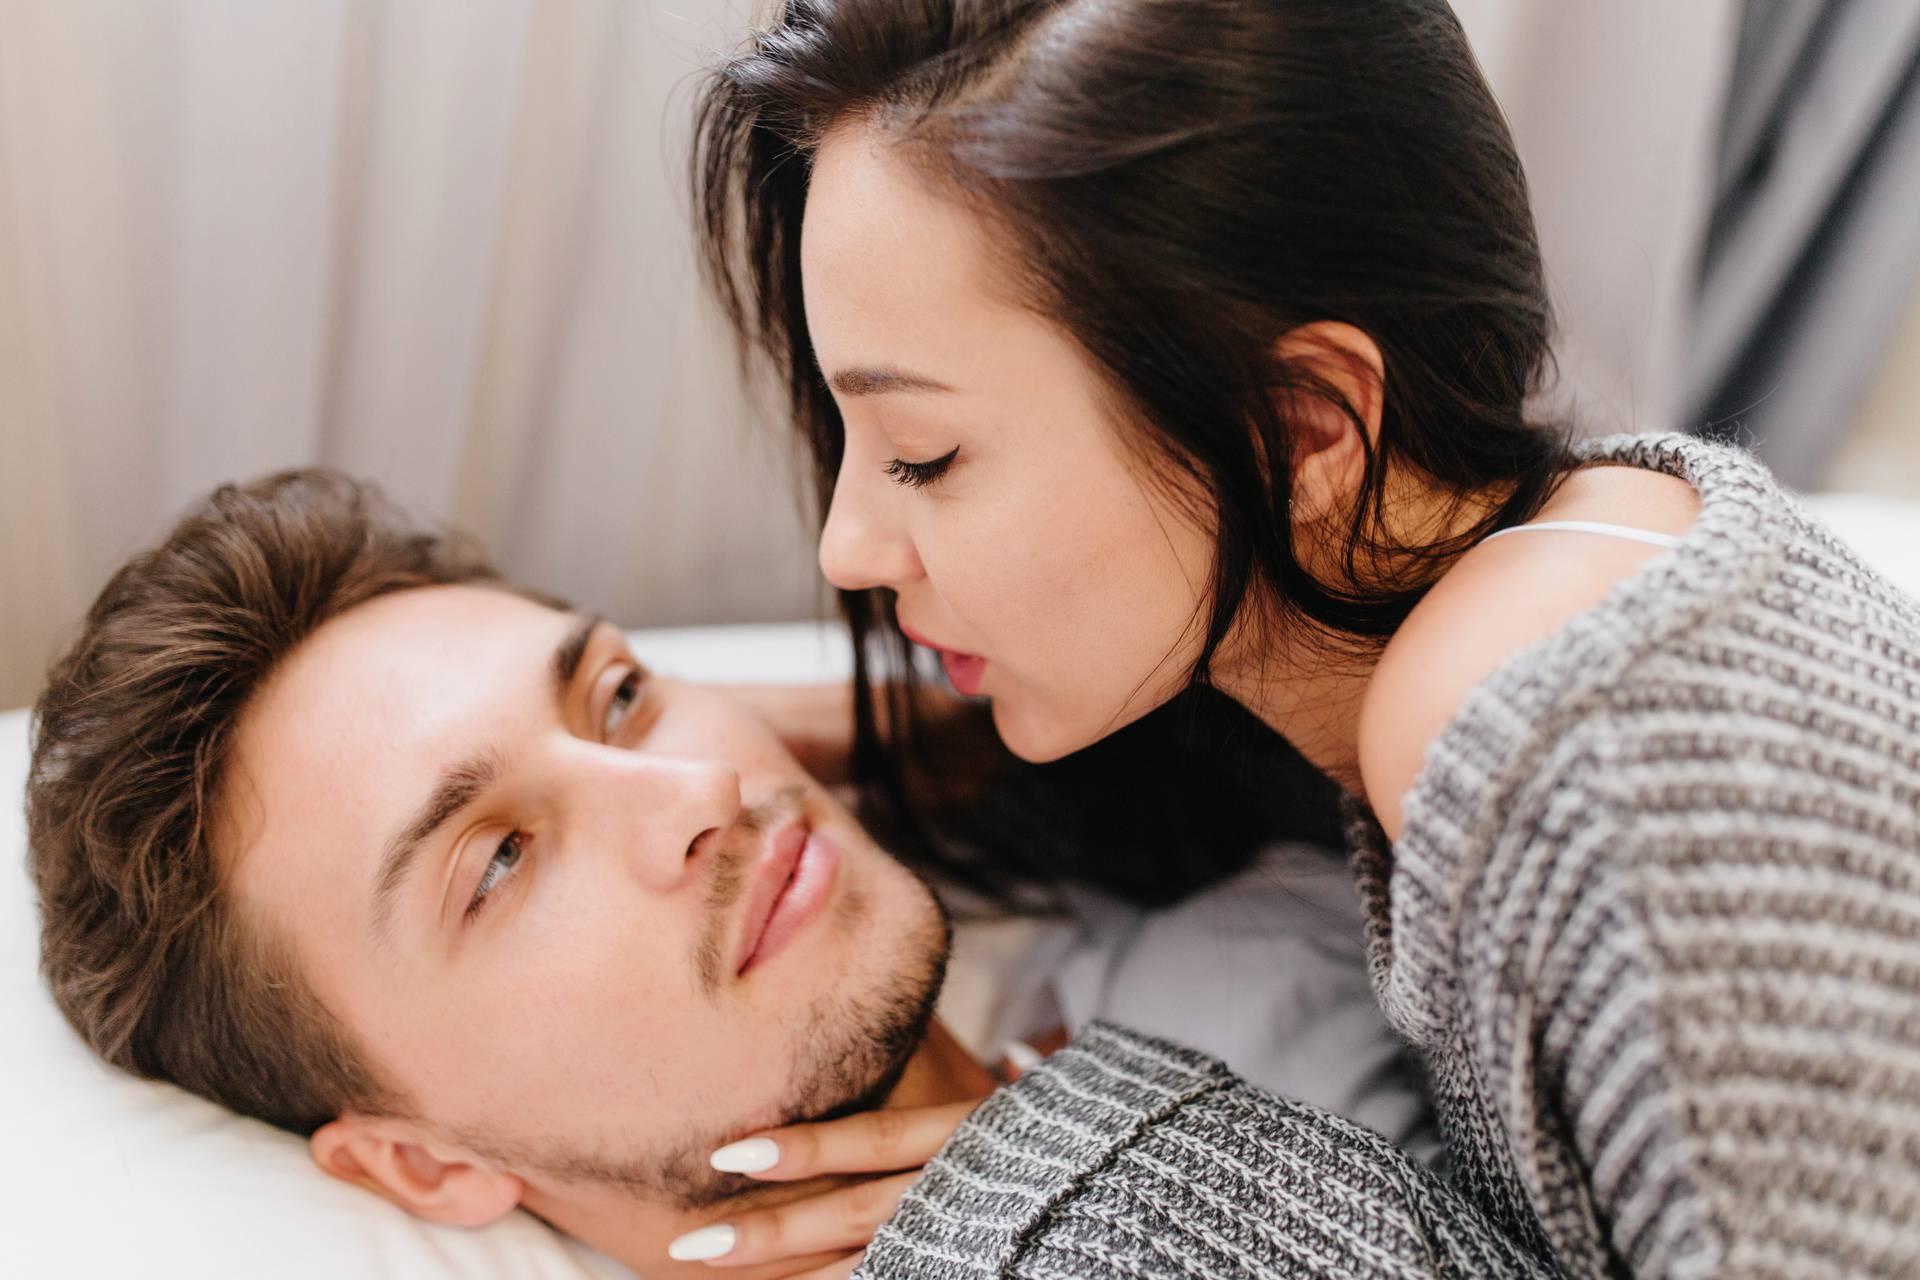 Razgovarajte o svojim željama, od emocionalnih do seksualnih